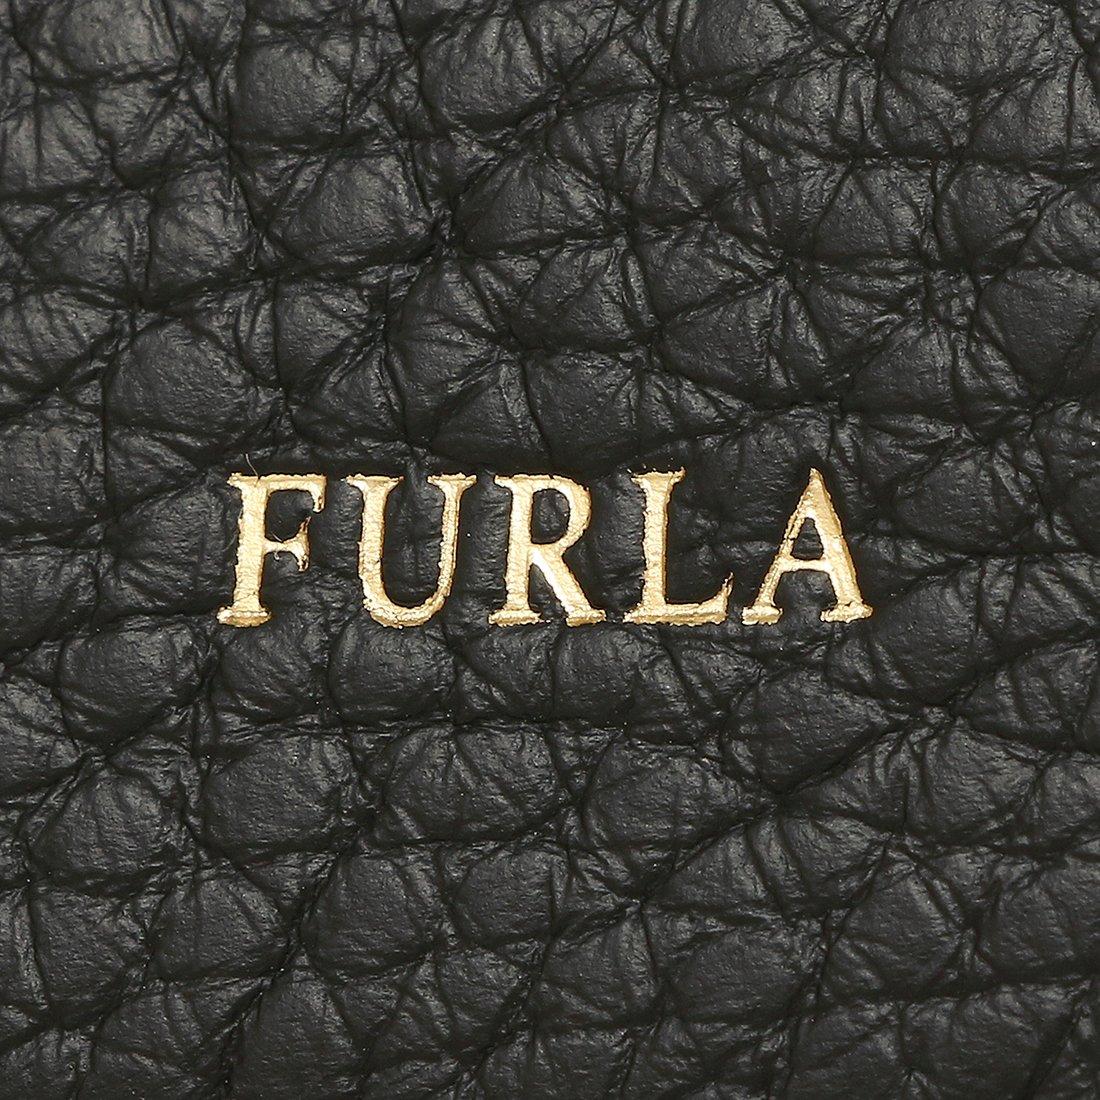 7f65aea4ee8b Amazon   [フルラ] ショルダーバッグ レディース FURLA 903554 BLS8 AGL ON1 ブラック マルチ [並行輸入品]    Furla(フルラ)   ショルダーバッグ